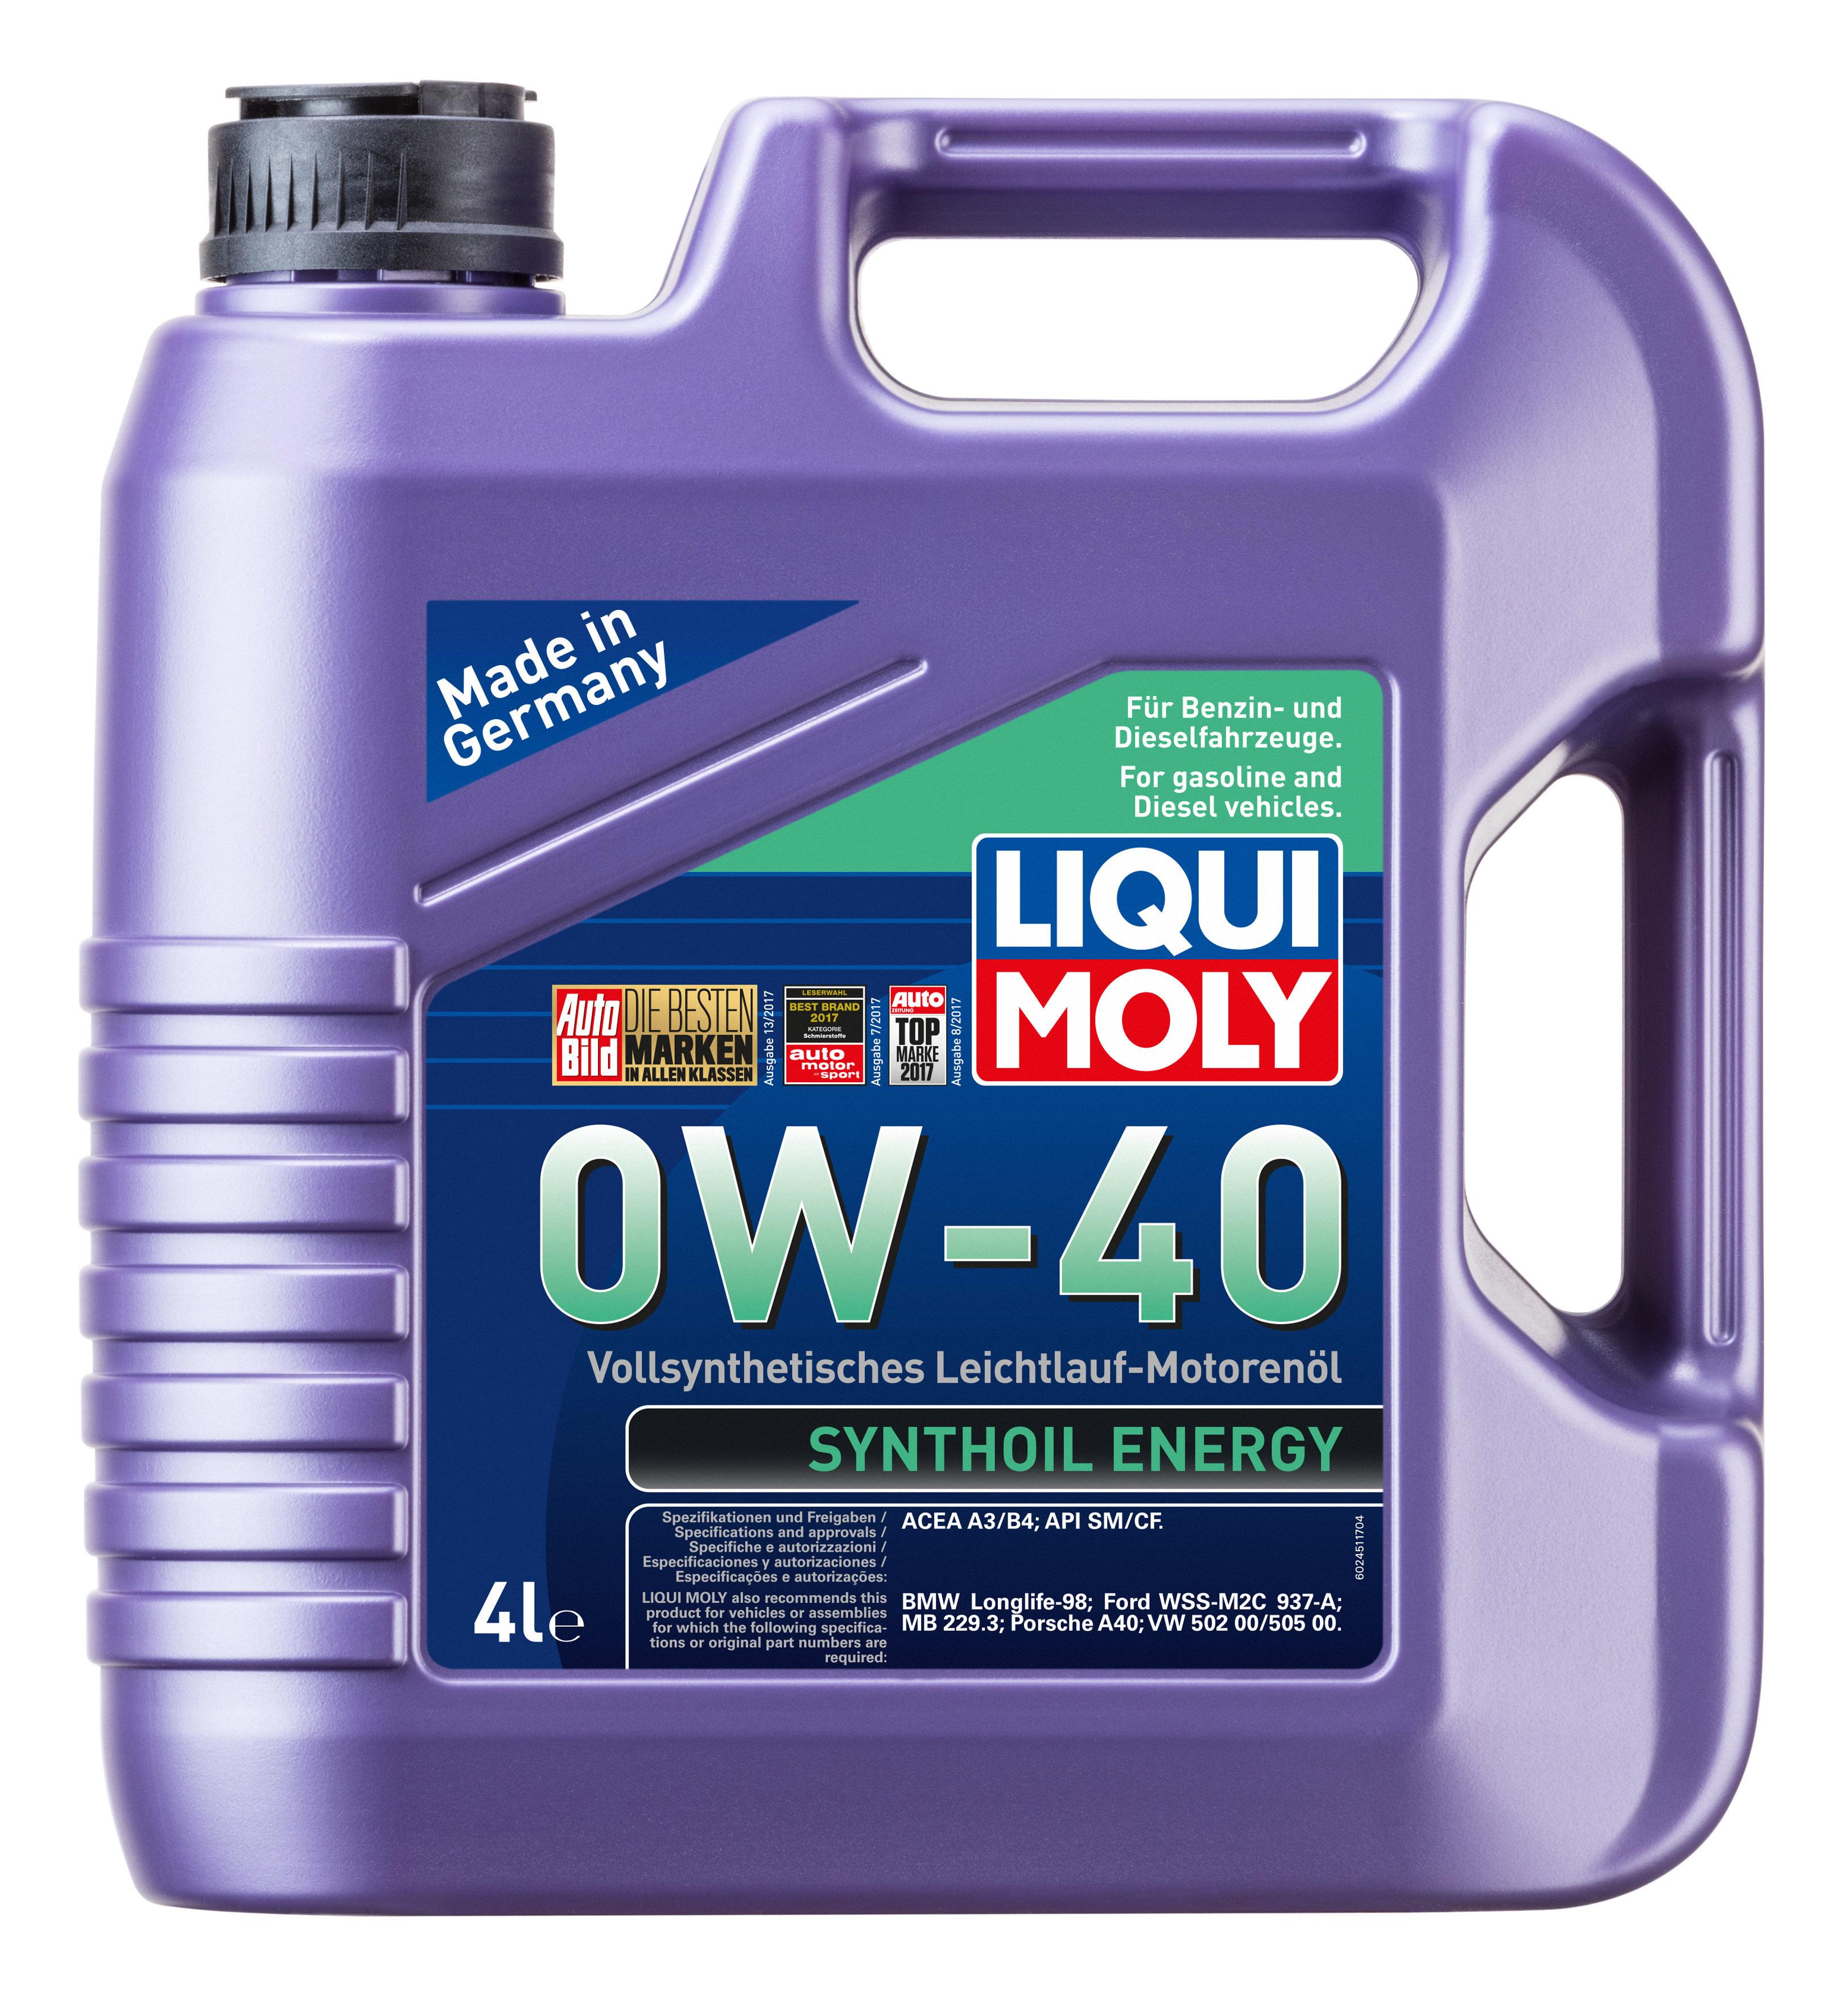 Liqui Moly Synthoil Energy SAE 0W-40